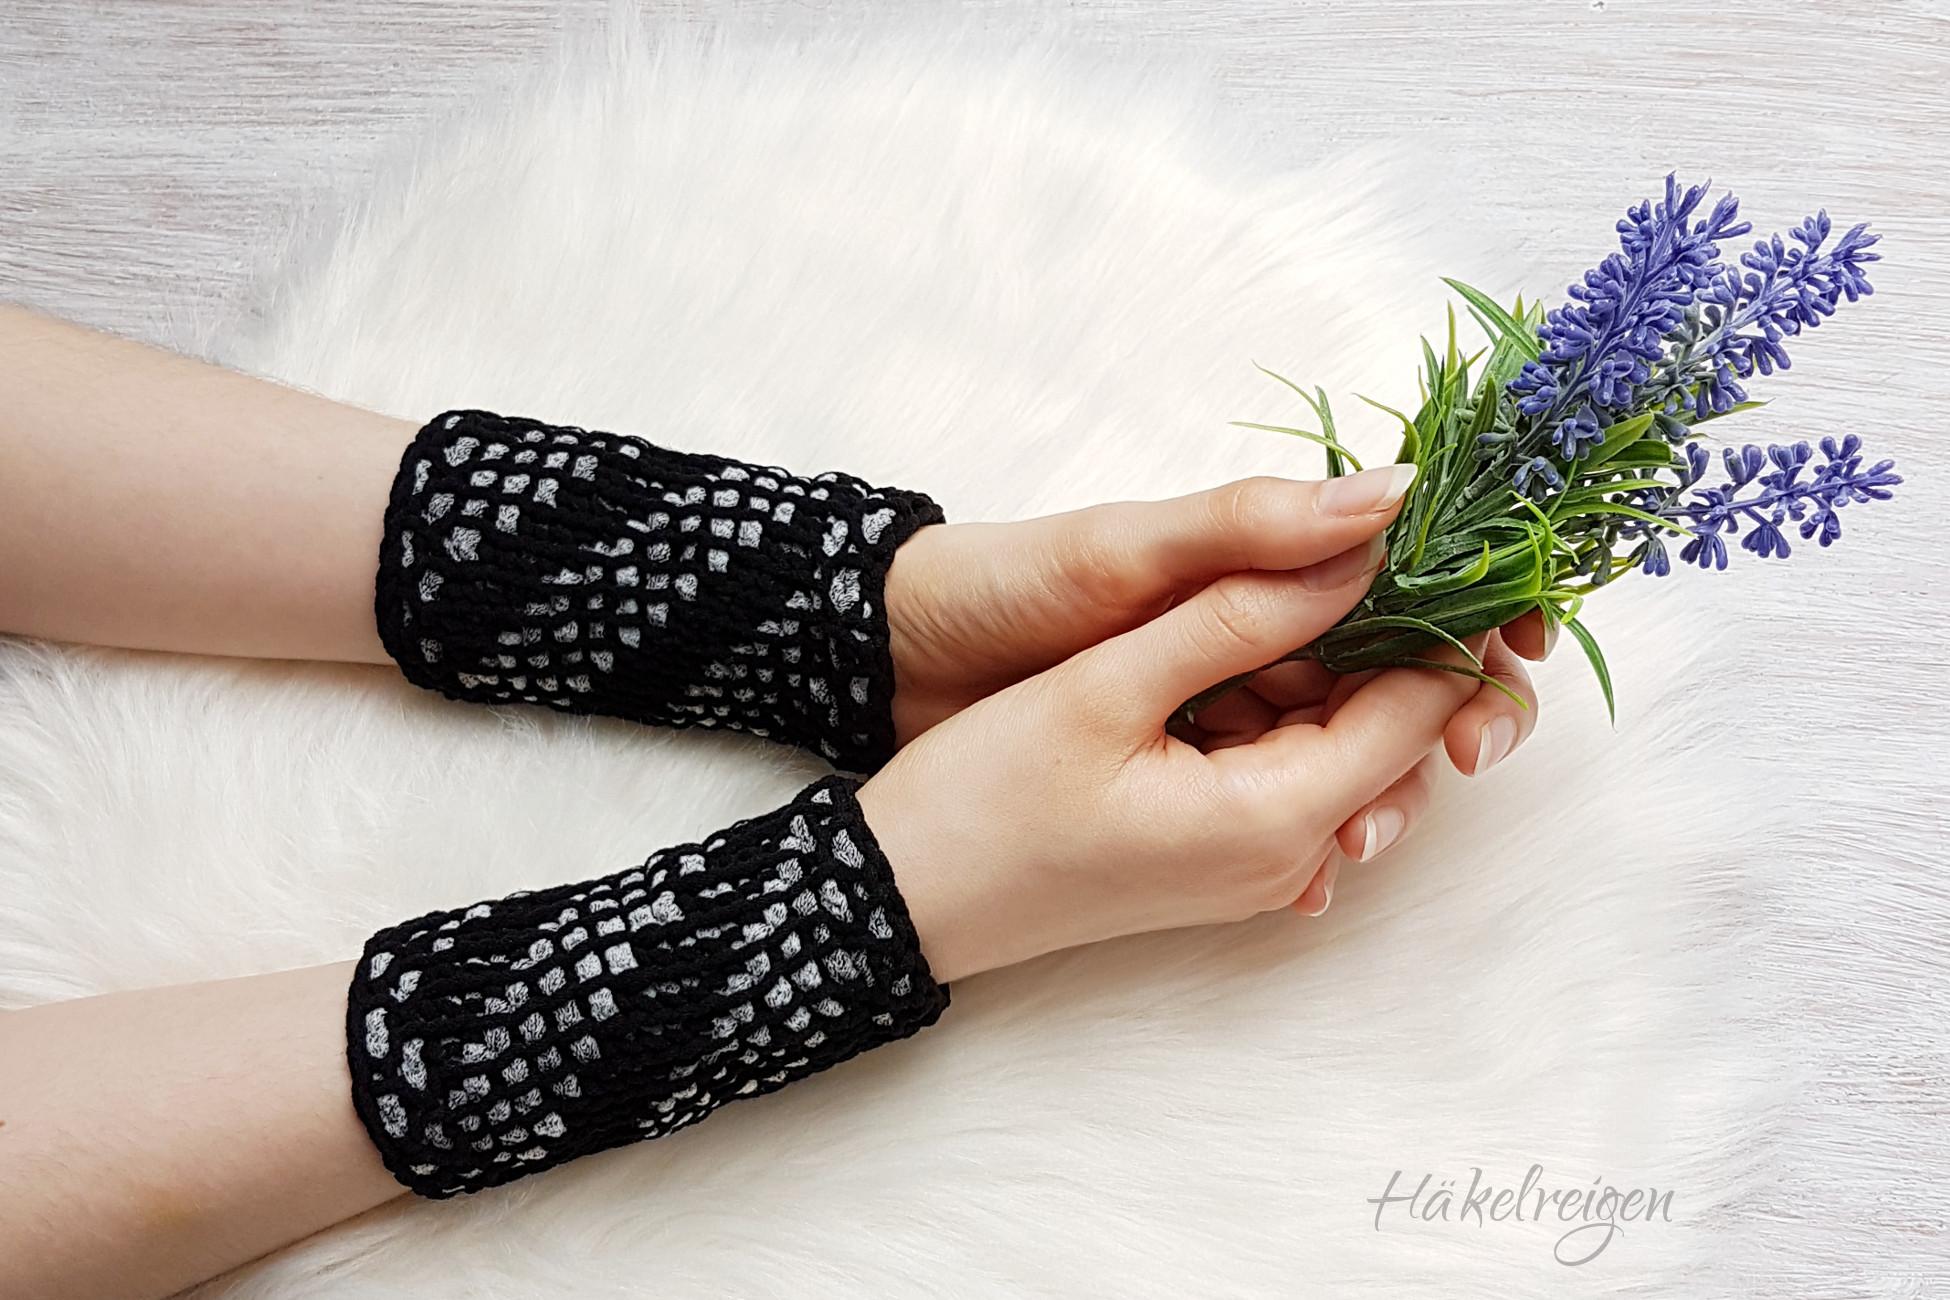 Armstulpen mit Woolly Hugs Shape